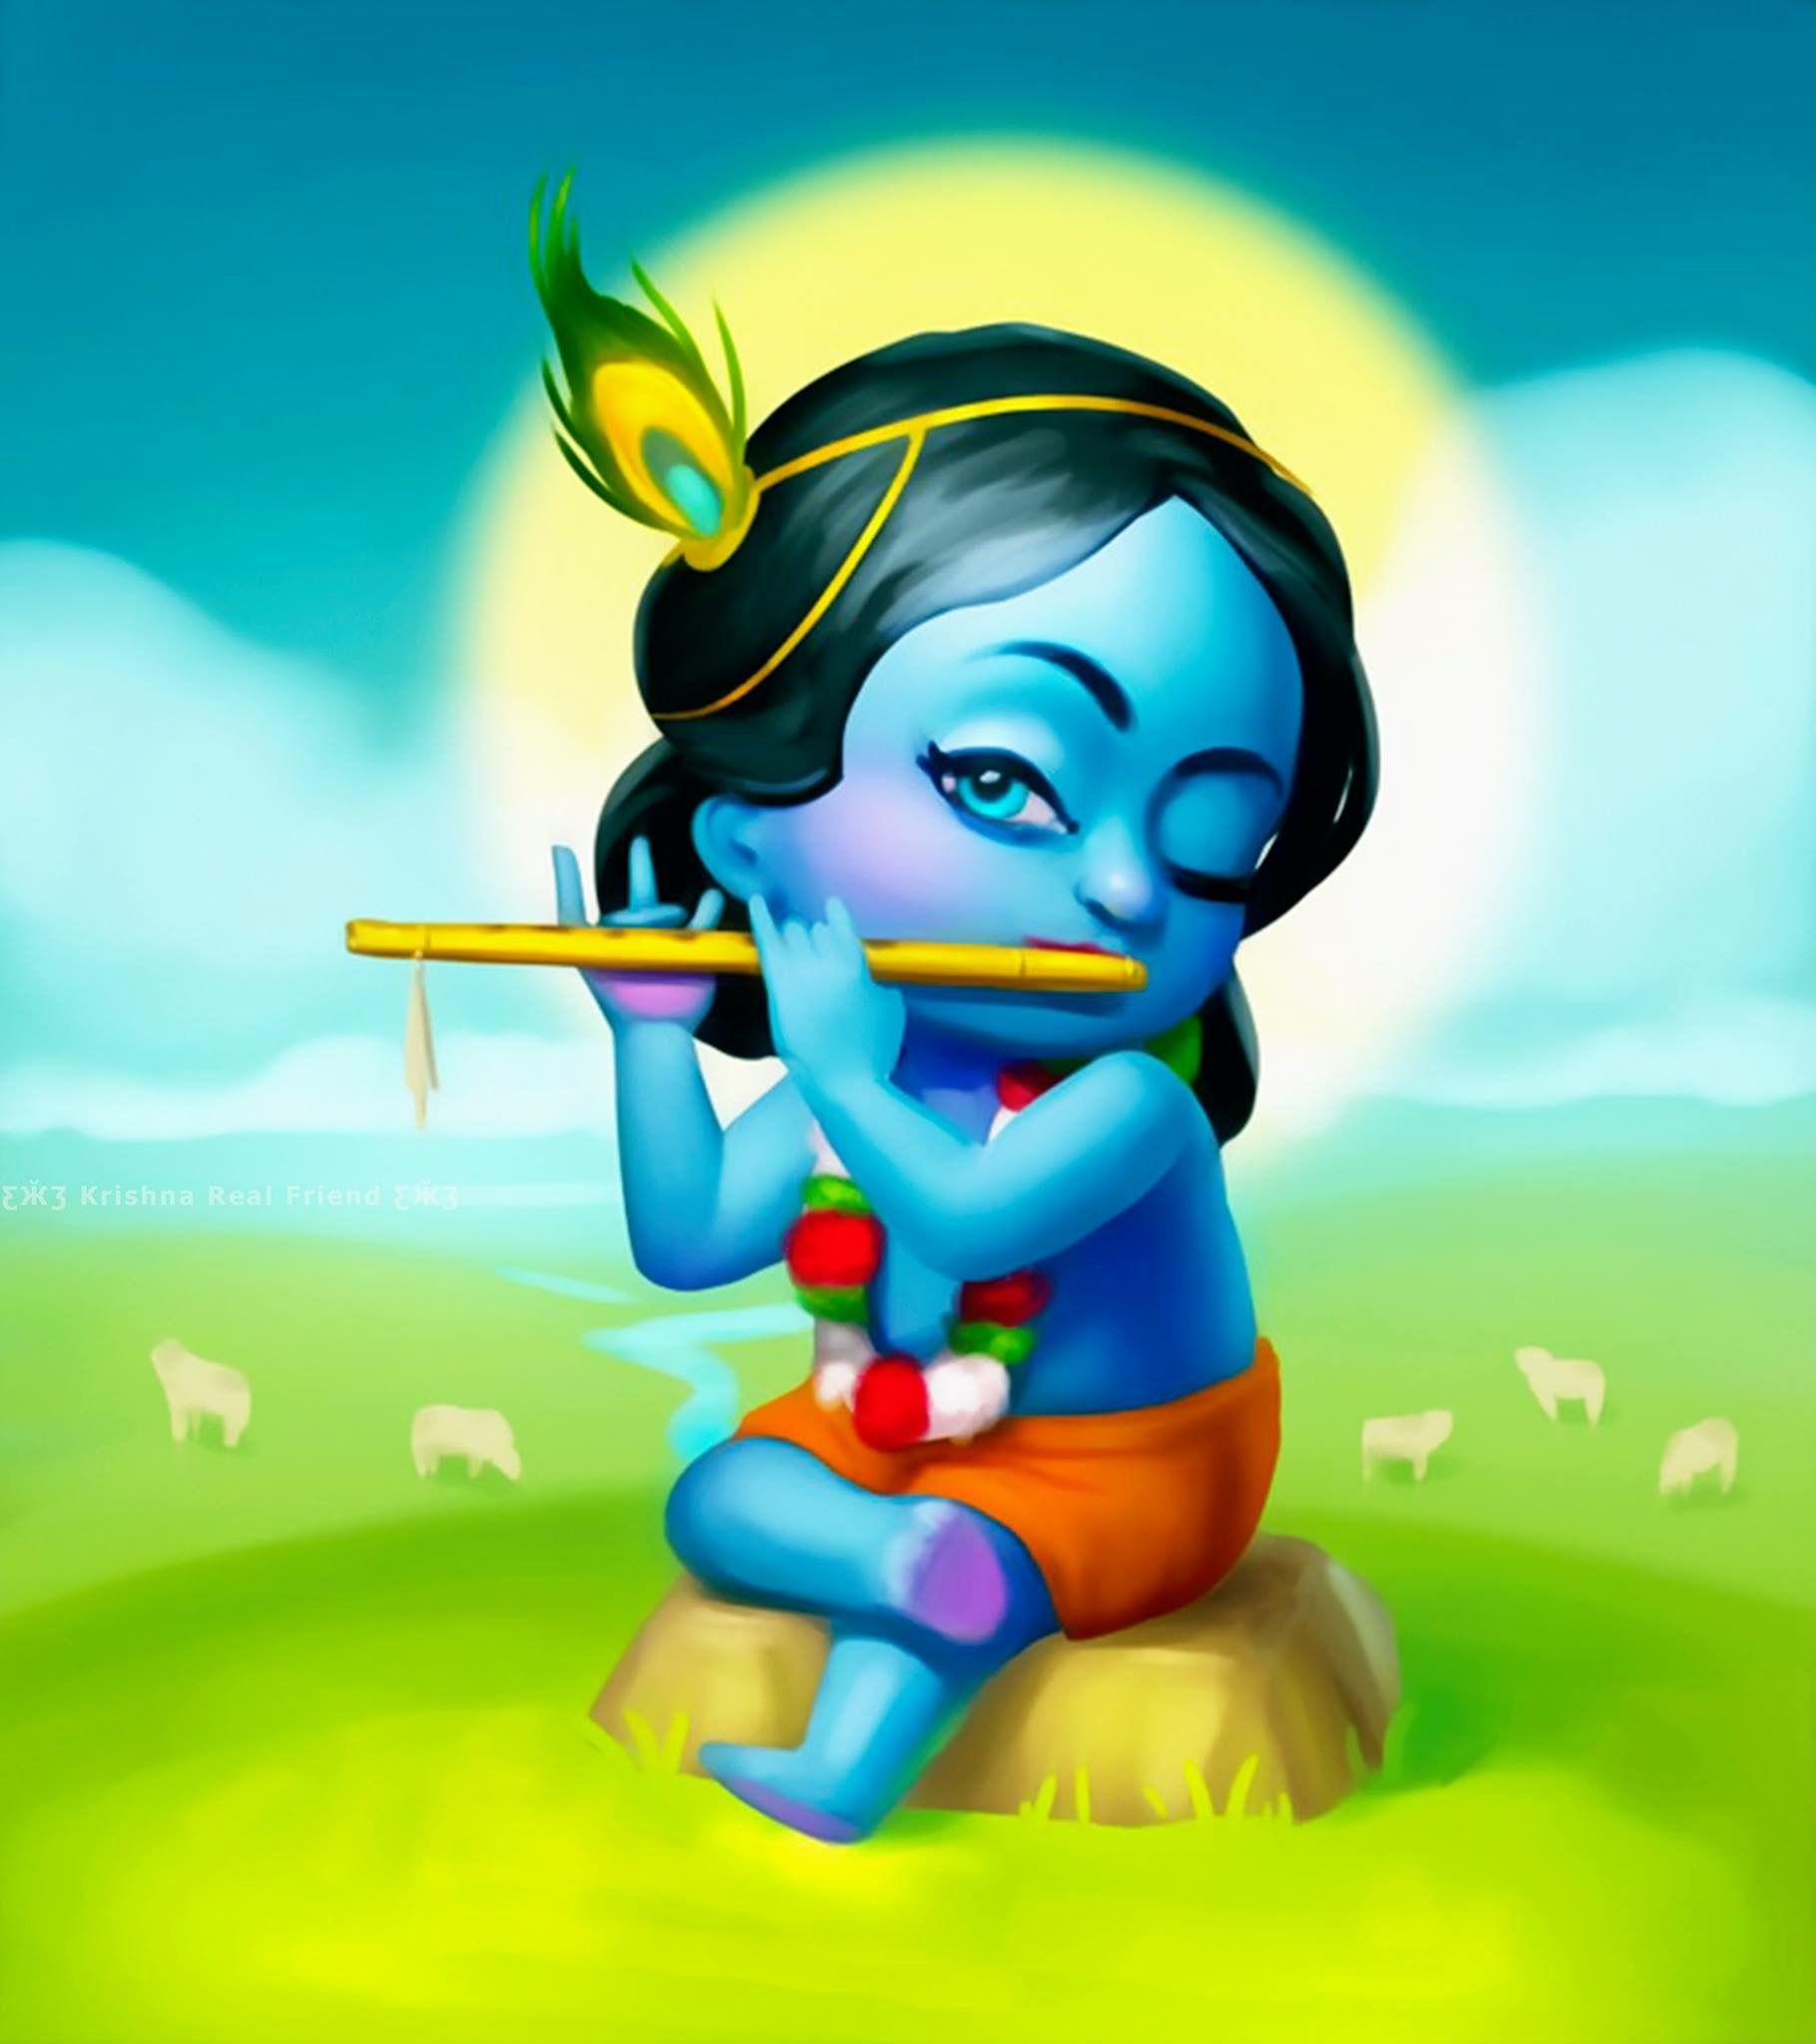 Pin By Diego Olioni On Imagens Cute Krishna Baby Krishna Cartoons Krishna